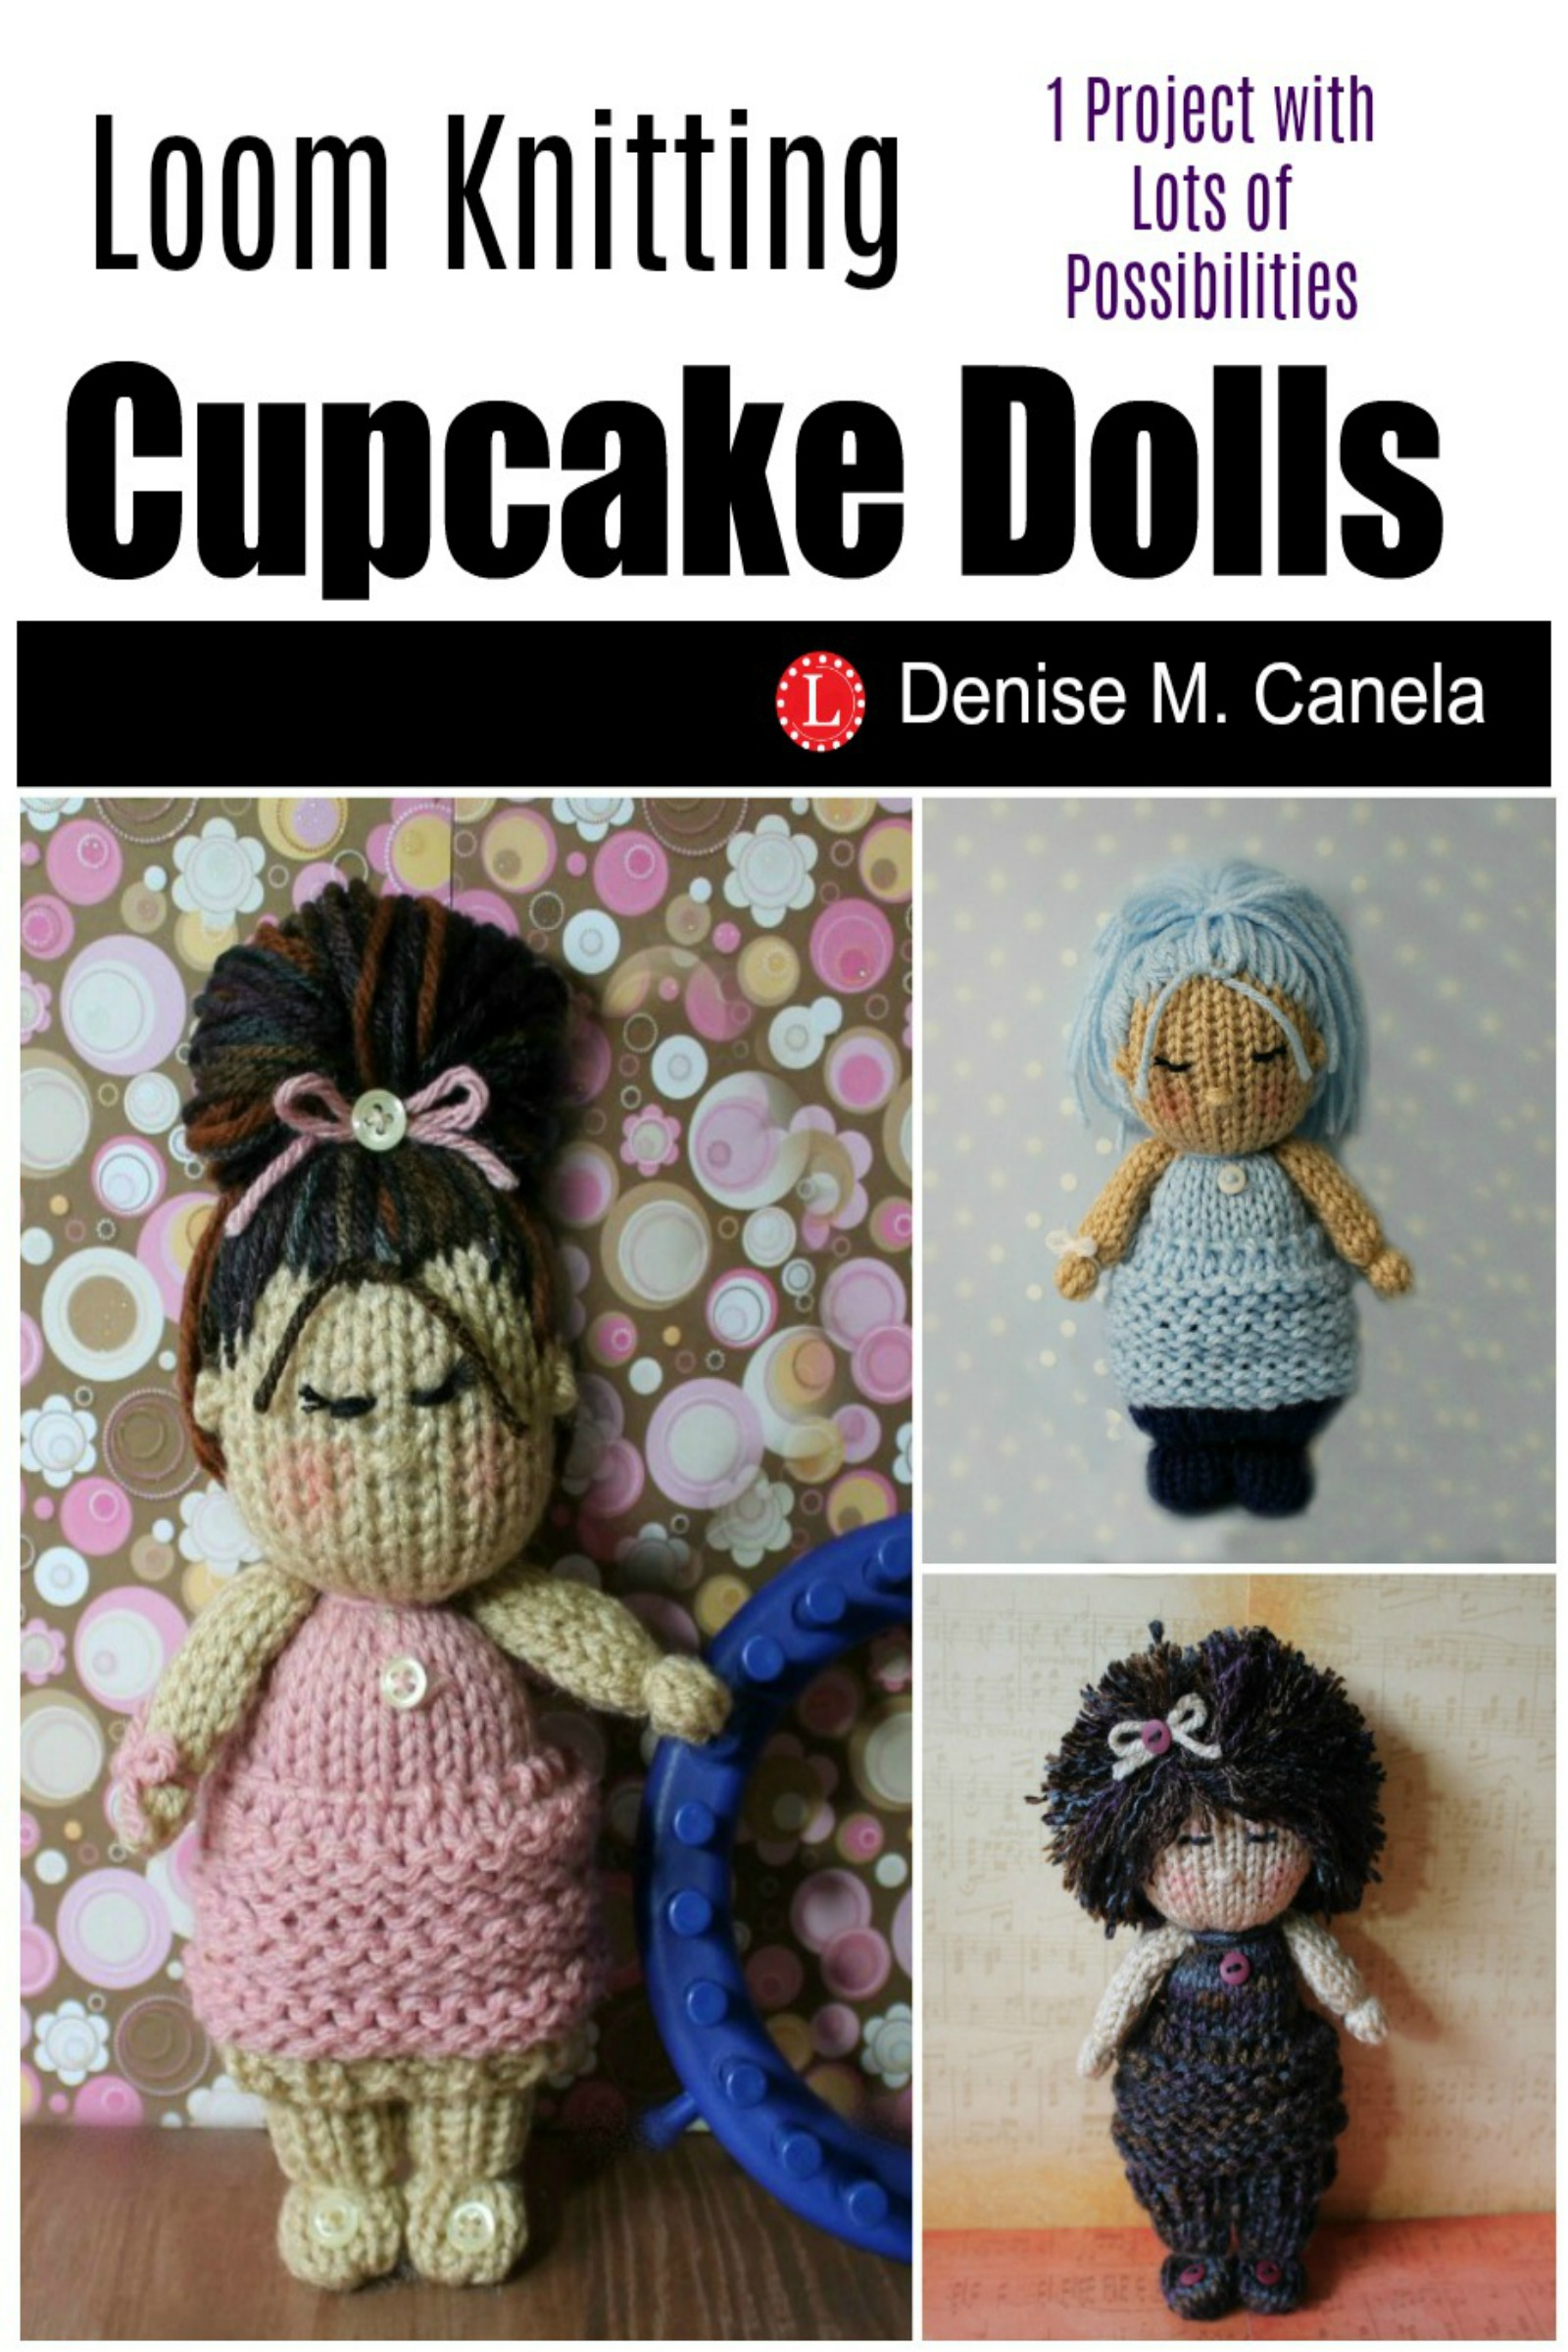 Smashwords Loom Knit Cupcake Dolls A Book By Denise M Canela